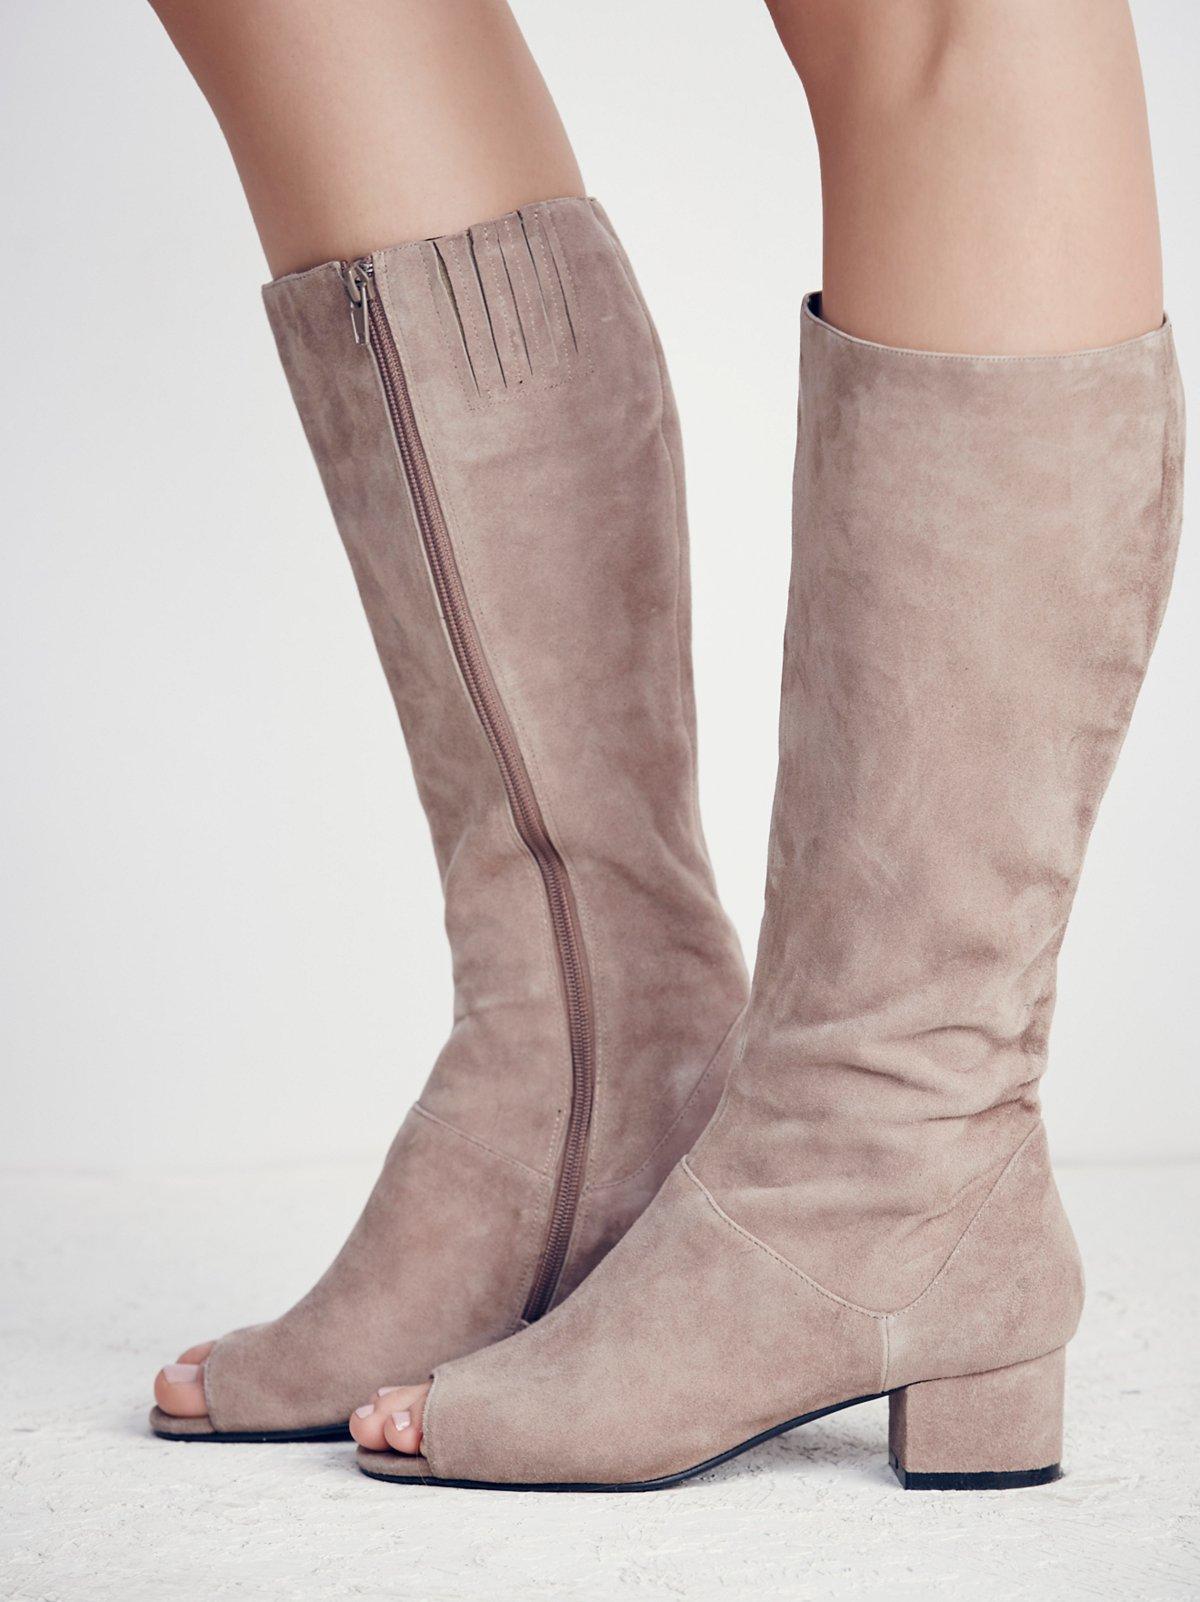 Studio Mod高跟及膝长靴